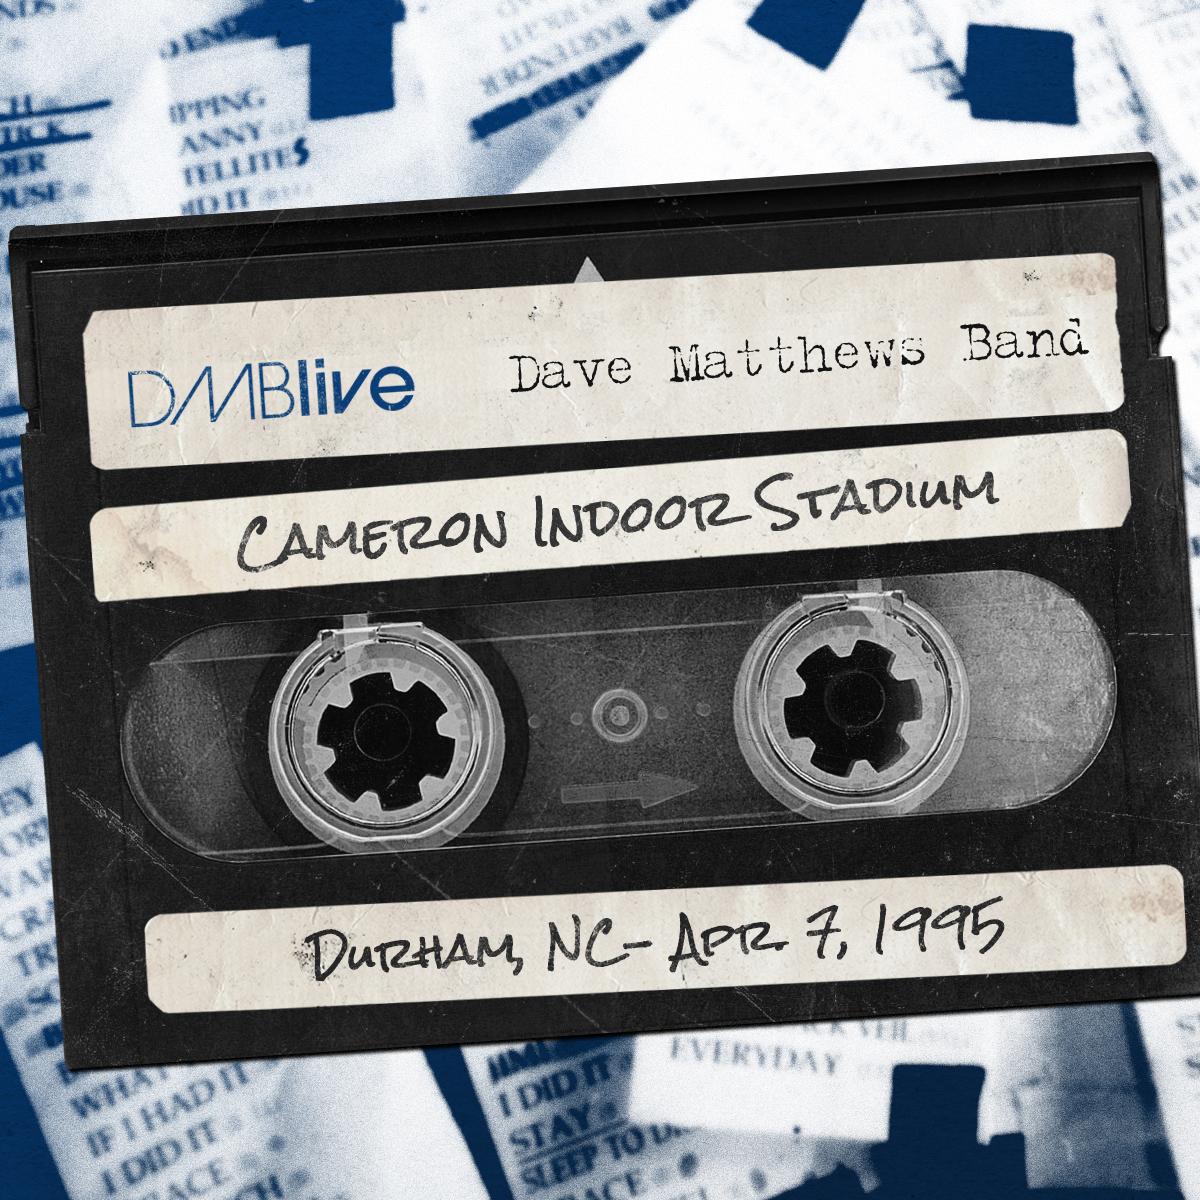 DMBLive Cameron Indoor Stadium, Durham, NC 4/7/1995